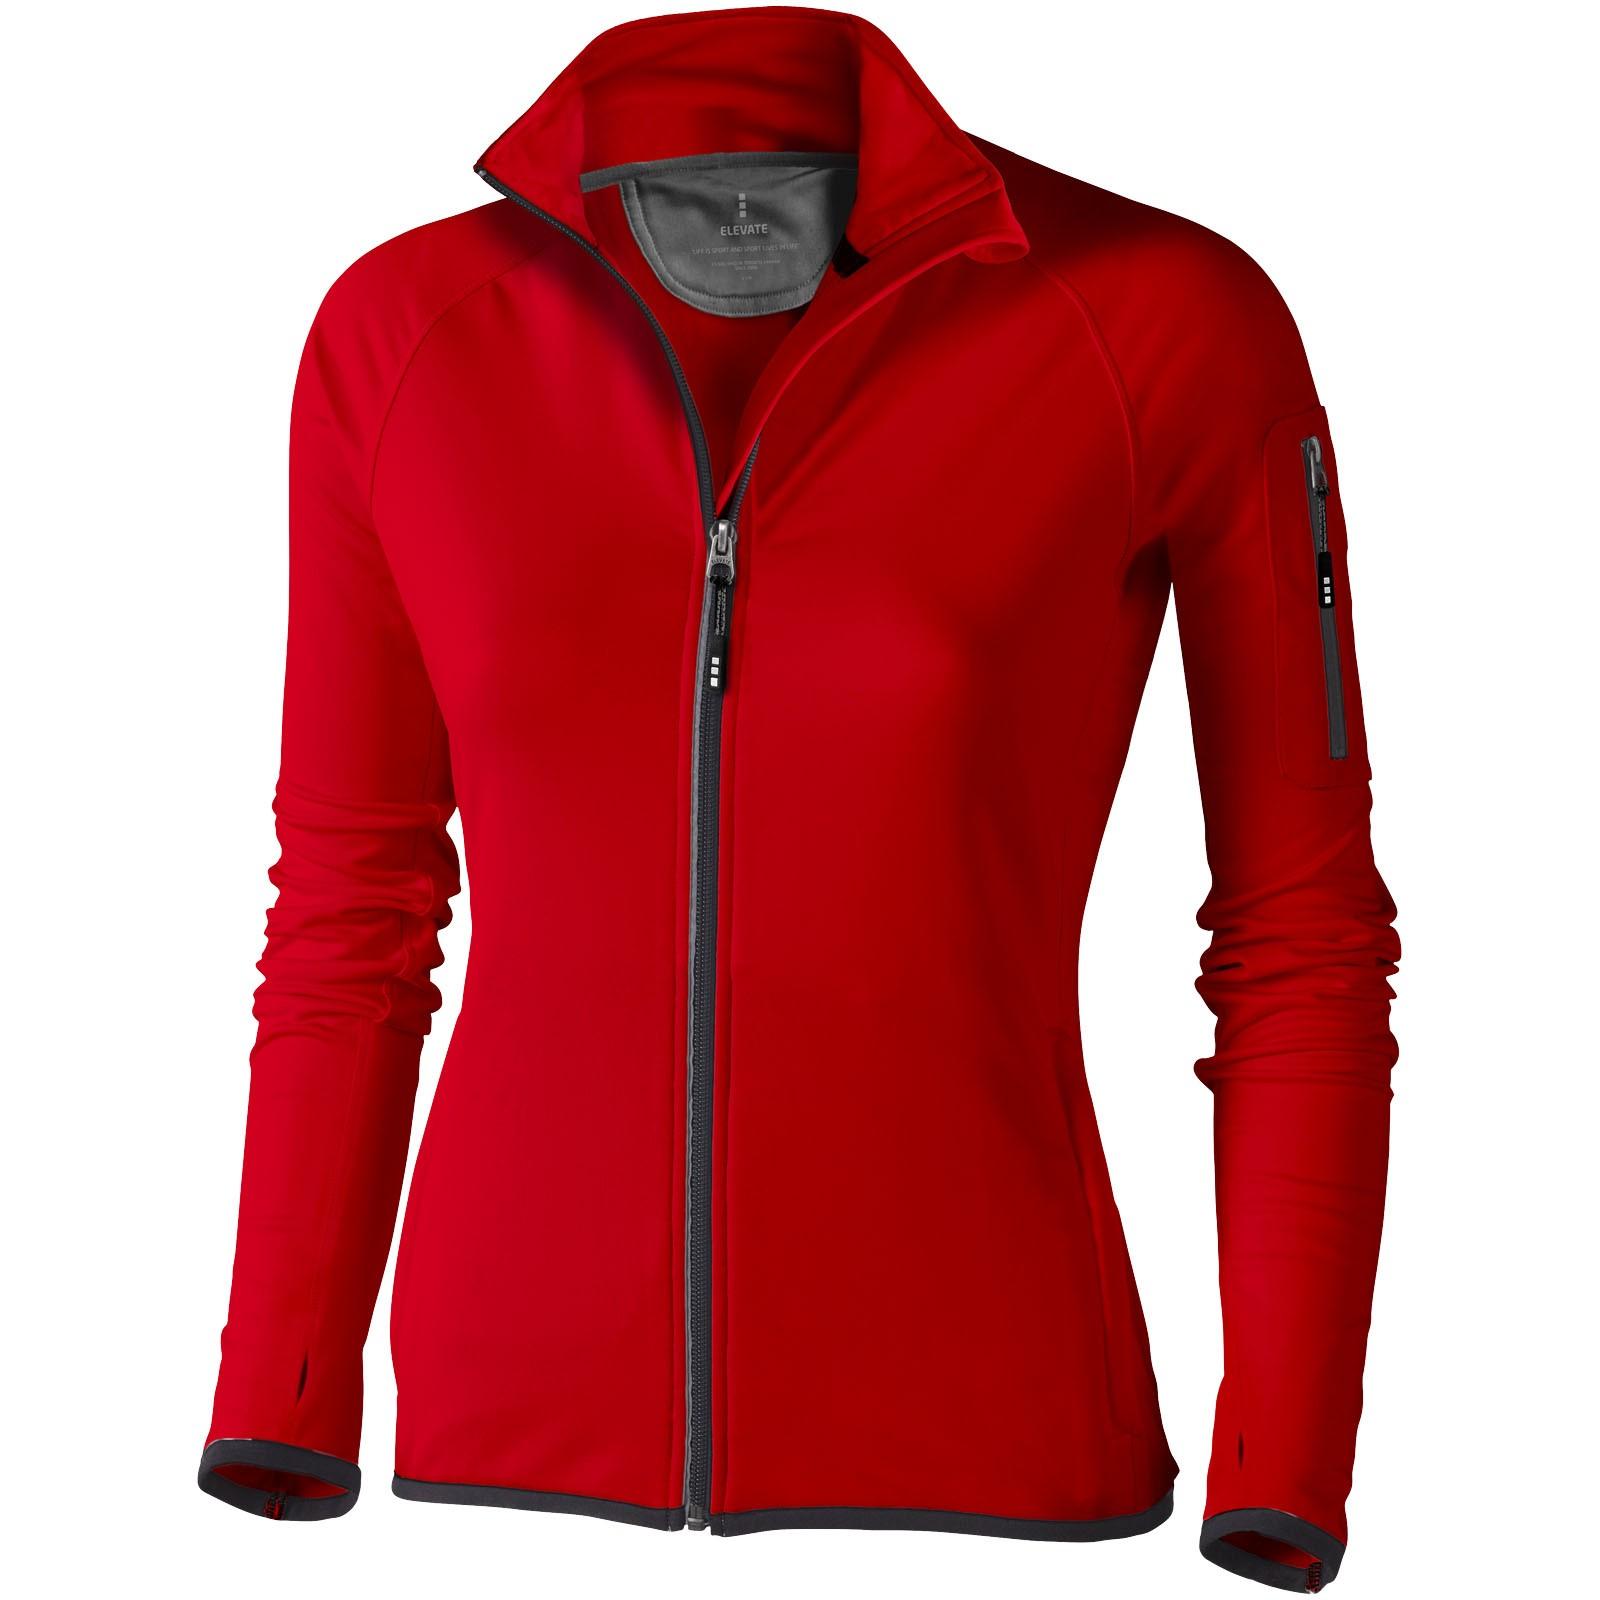 Mani power fleece full zip ladies jacket - Red / XL